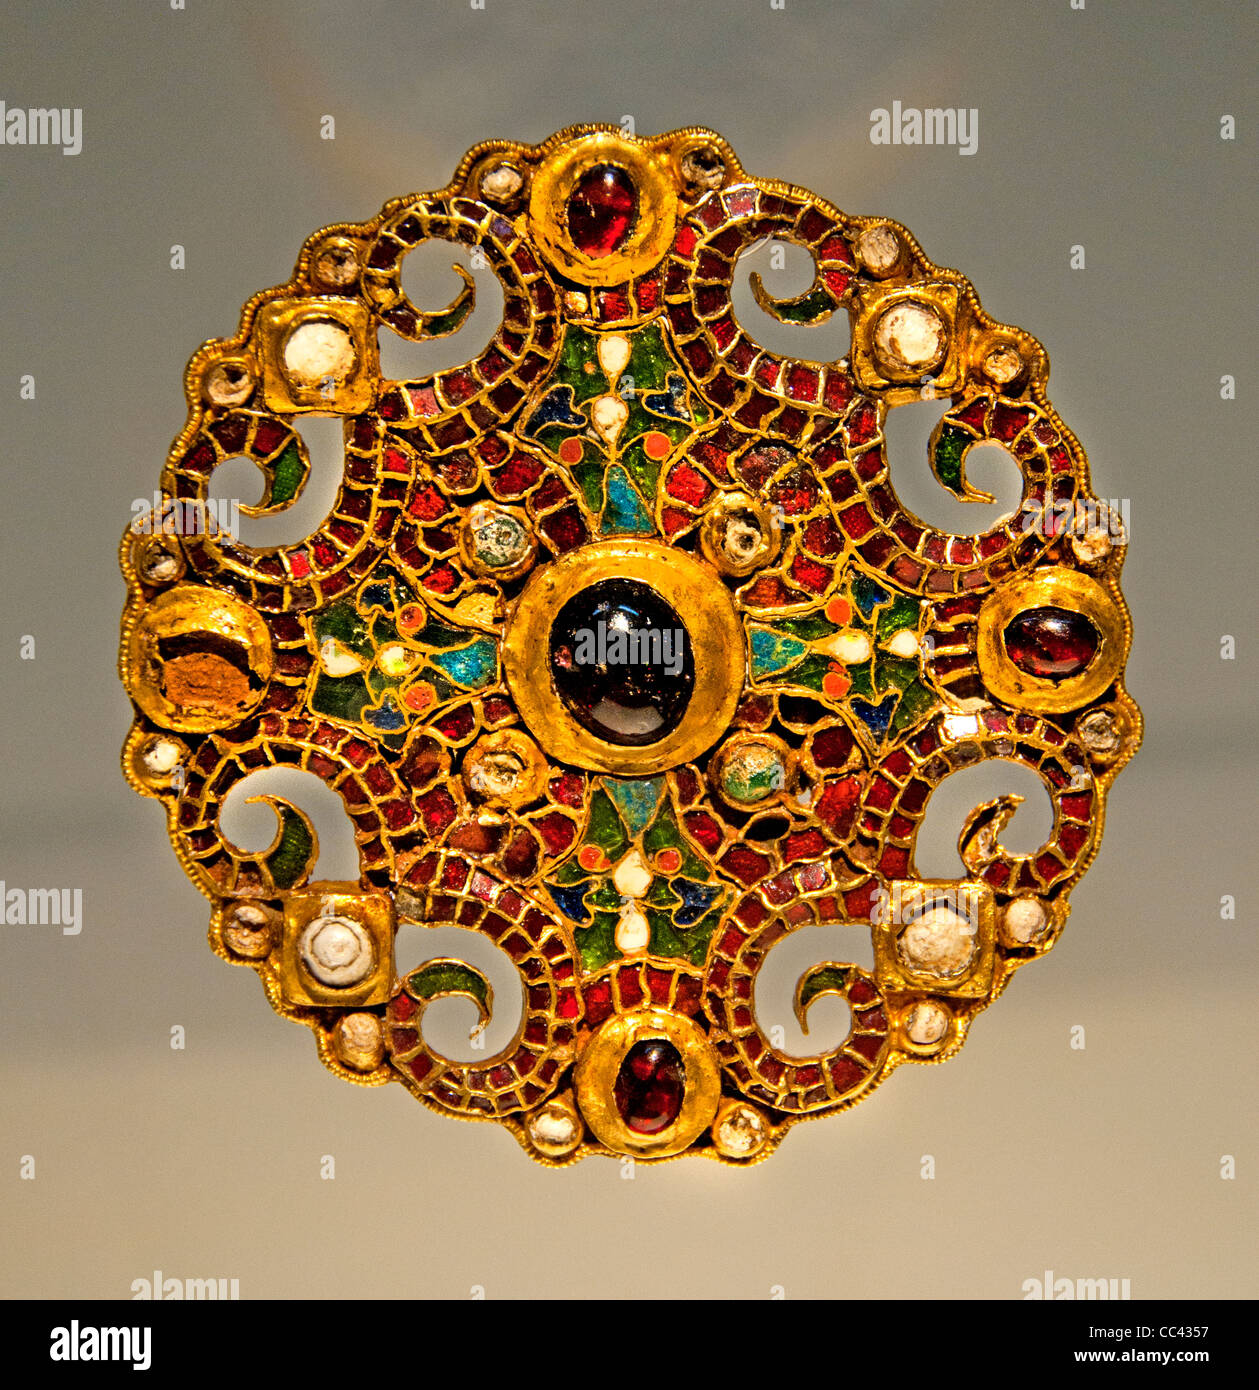 Fibula Dutch brooch Dorestad Wijk bij Duurstede Netherlands gold red gemstone pearls 800 AC Burgundian workshop - Stock Image